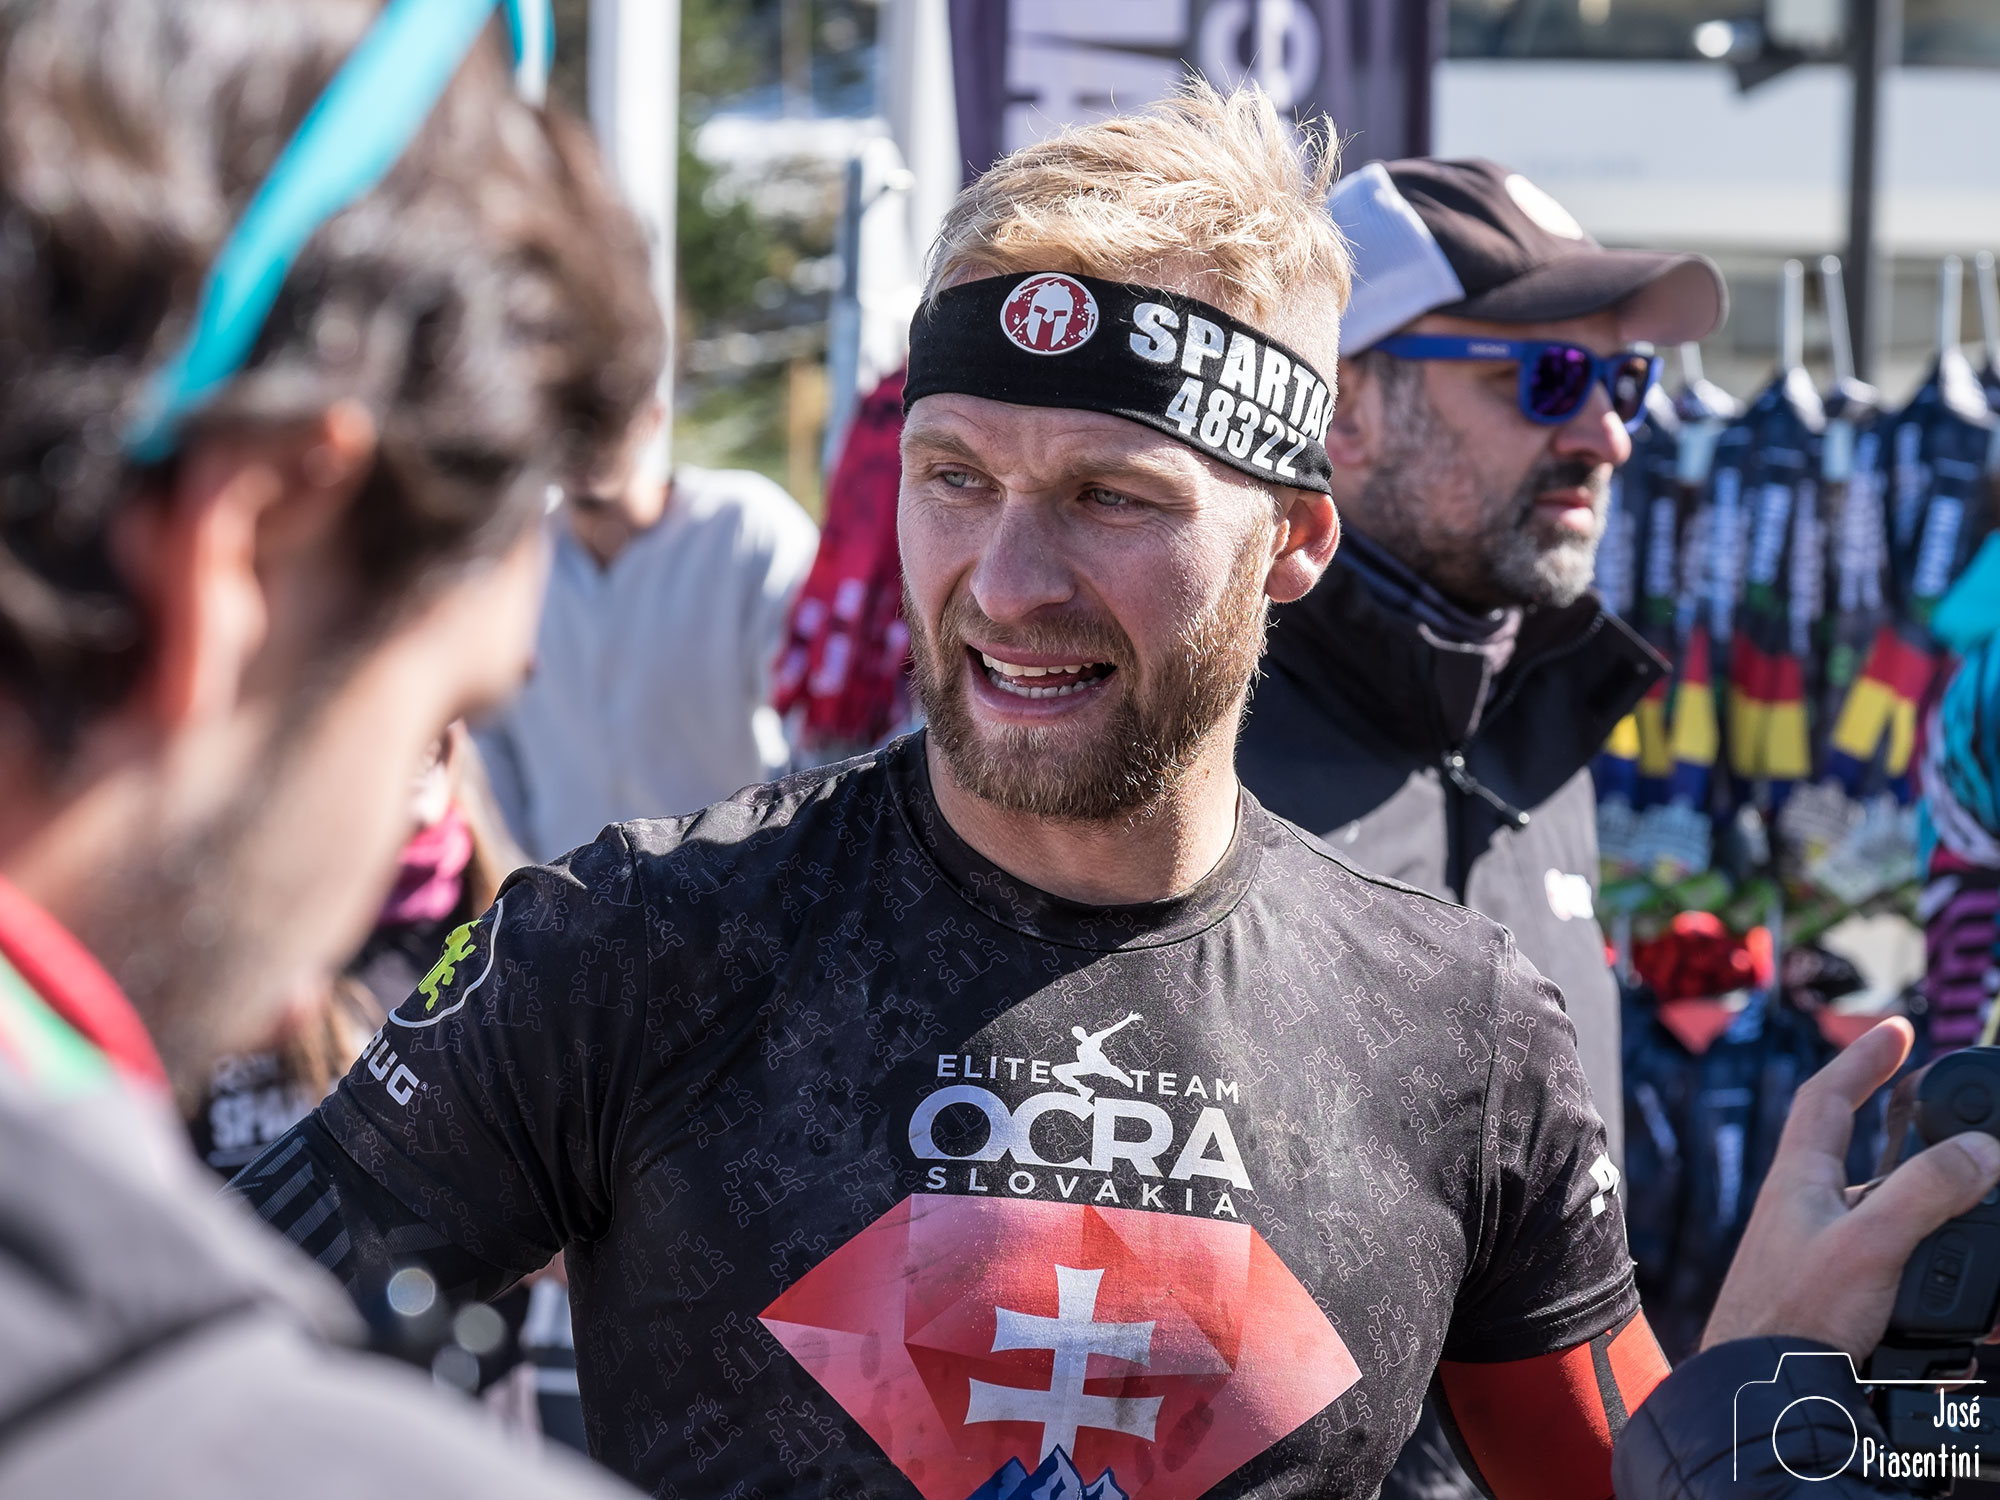 Michal Rajniak ganador Spartan Race Andorra